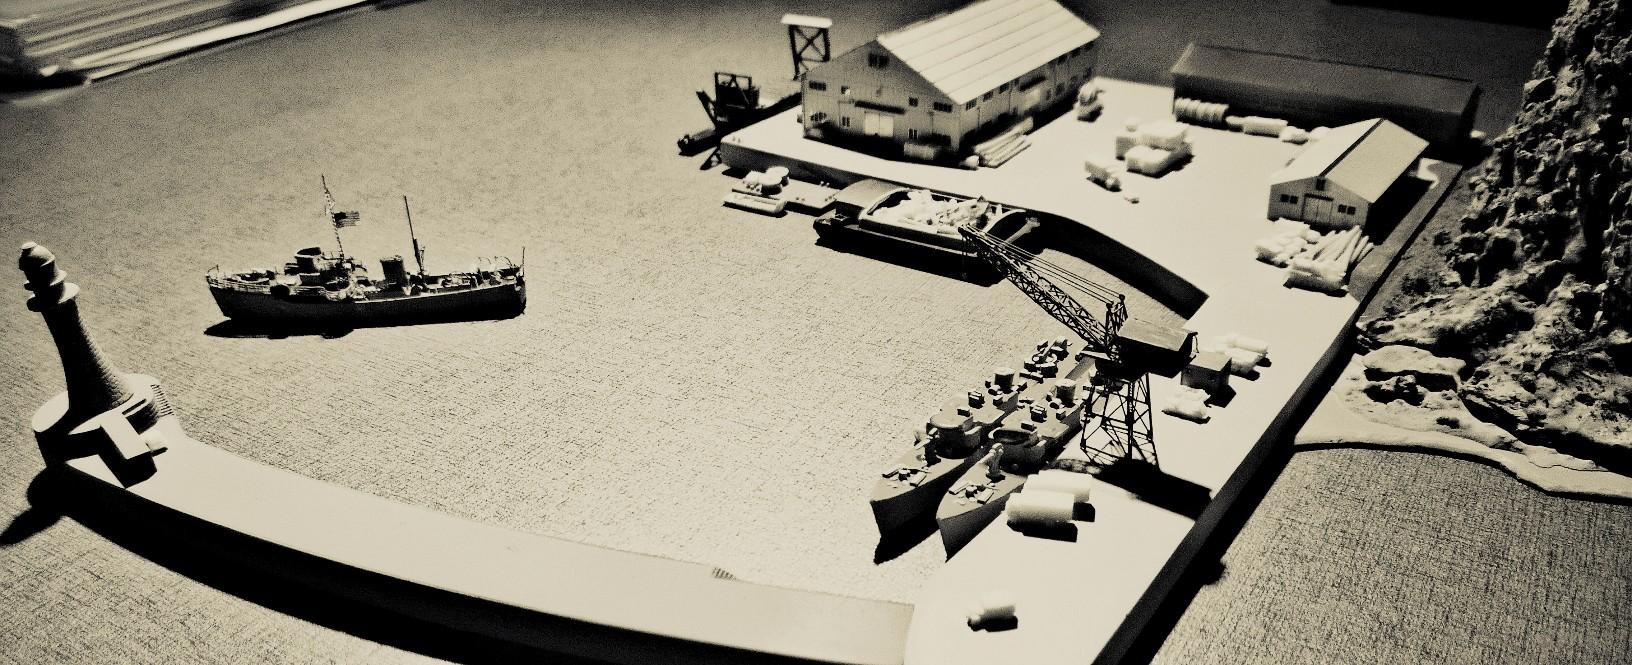 Diorama base navale 1/700 par Nesquik - Page 3 GWyUr